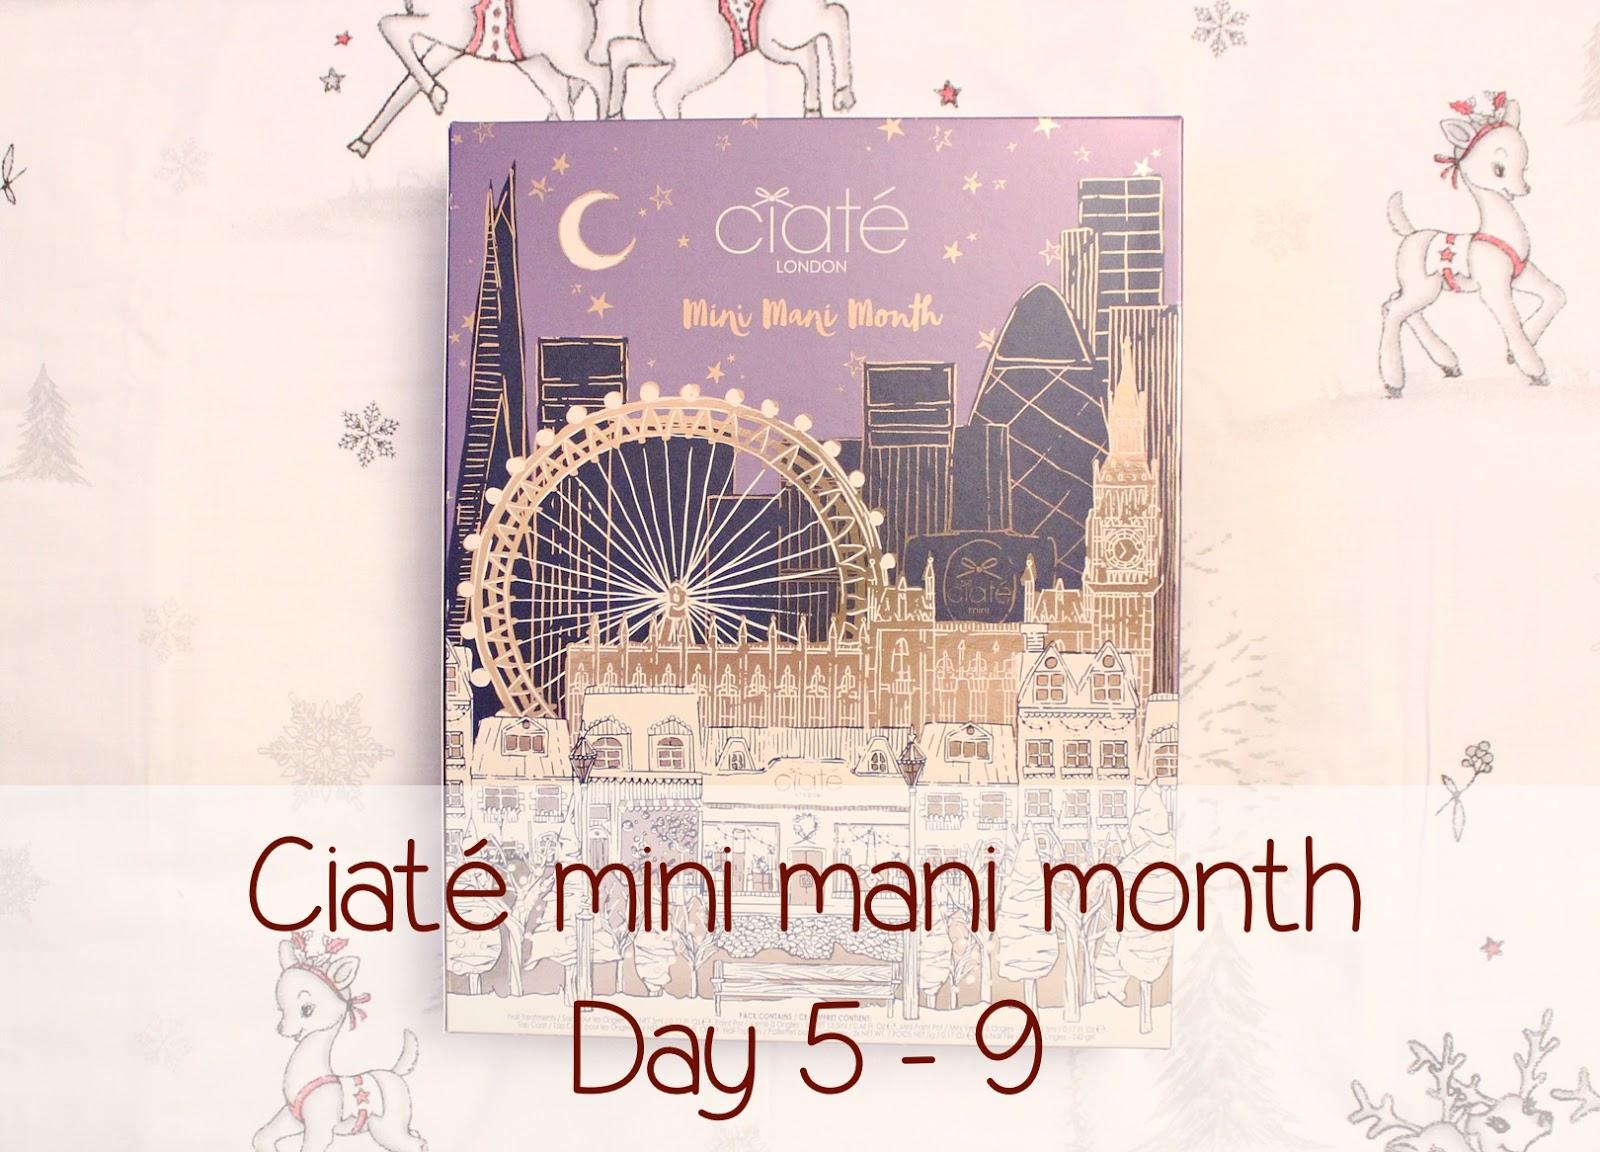 Ciaté mini mani month